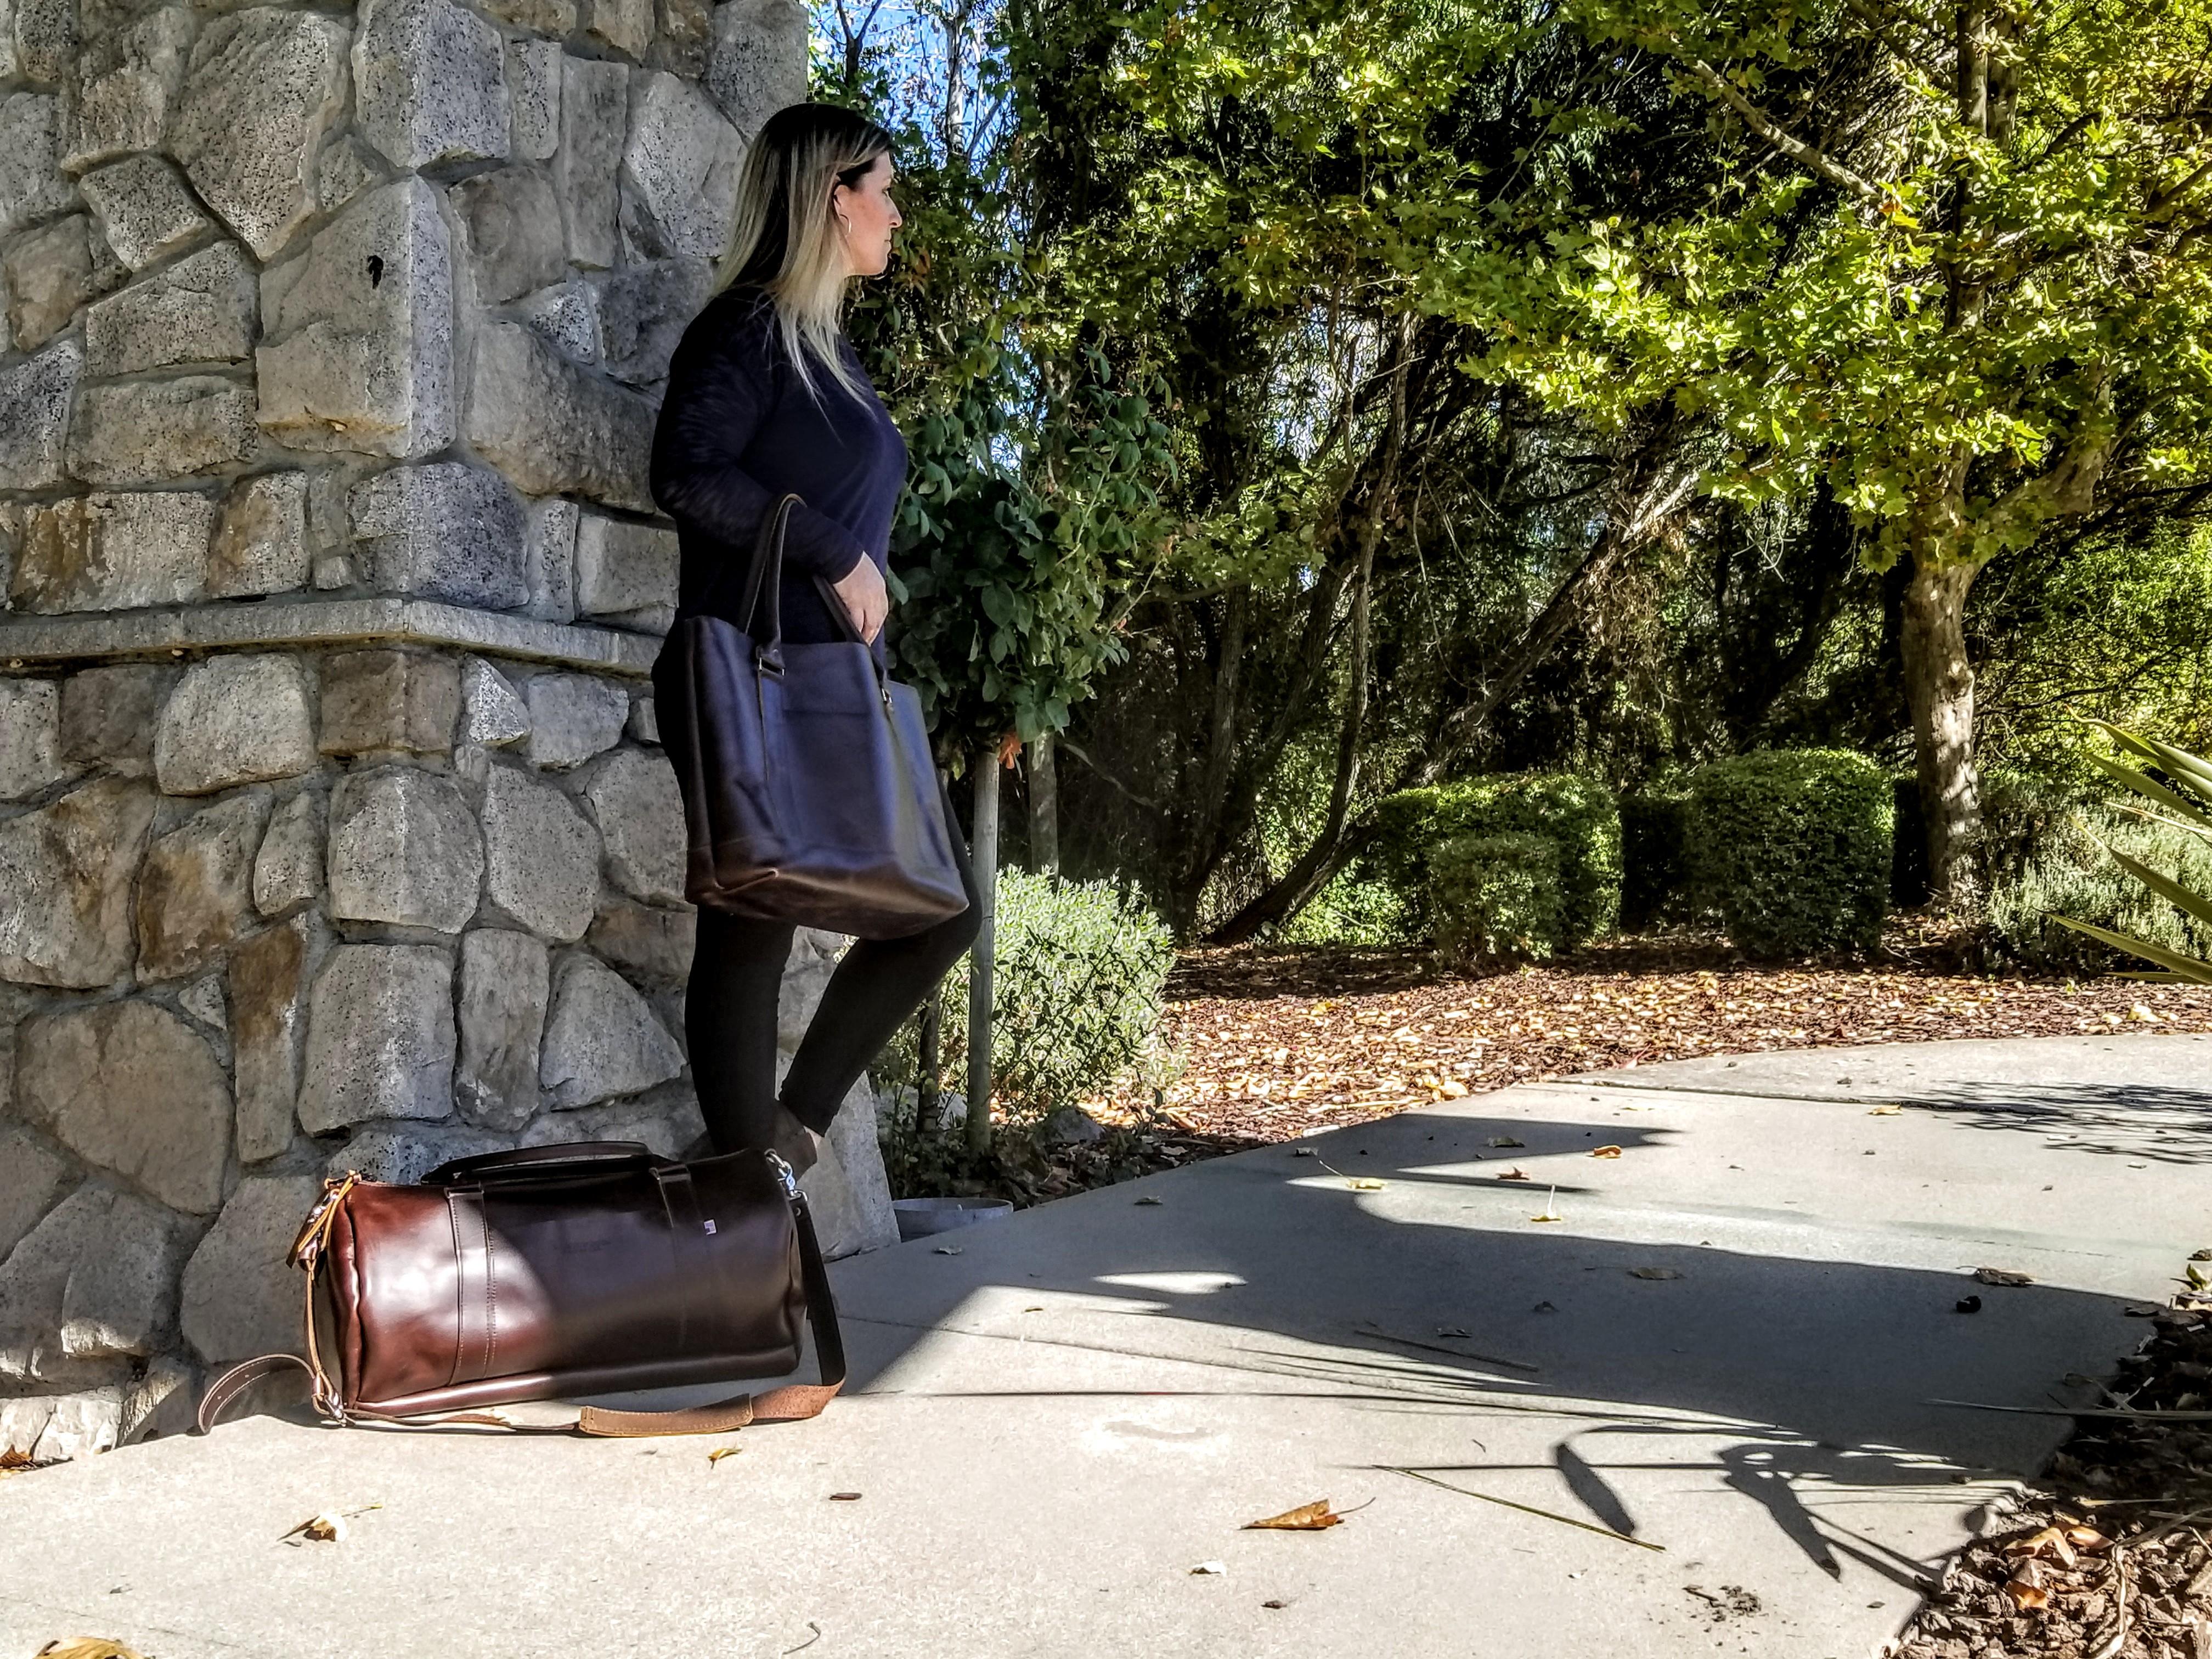 duffel-tote-coffee-travel-bag-copper-river-bag-co-87654f.jpg